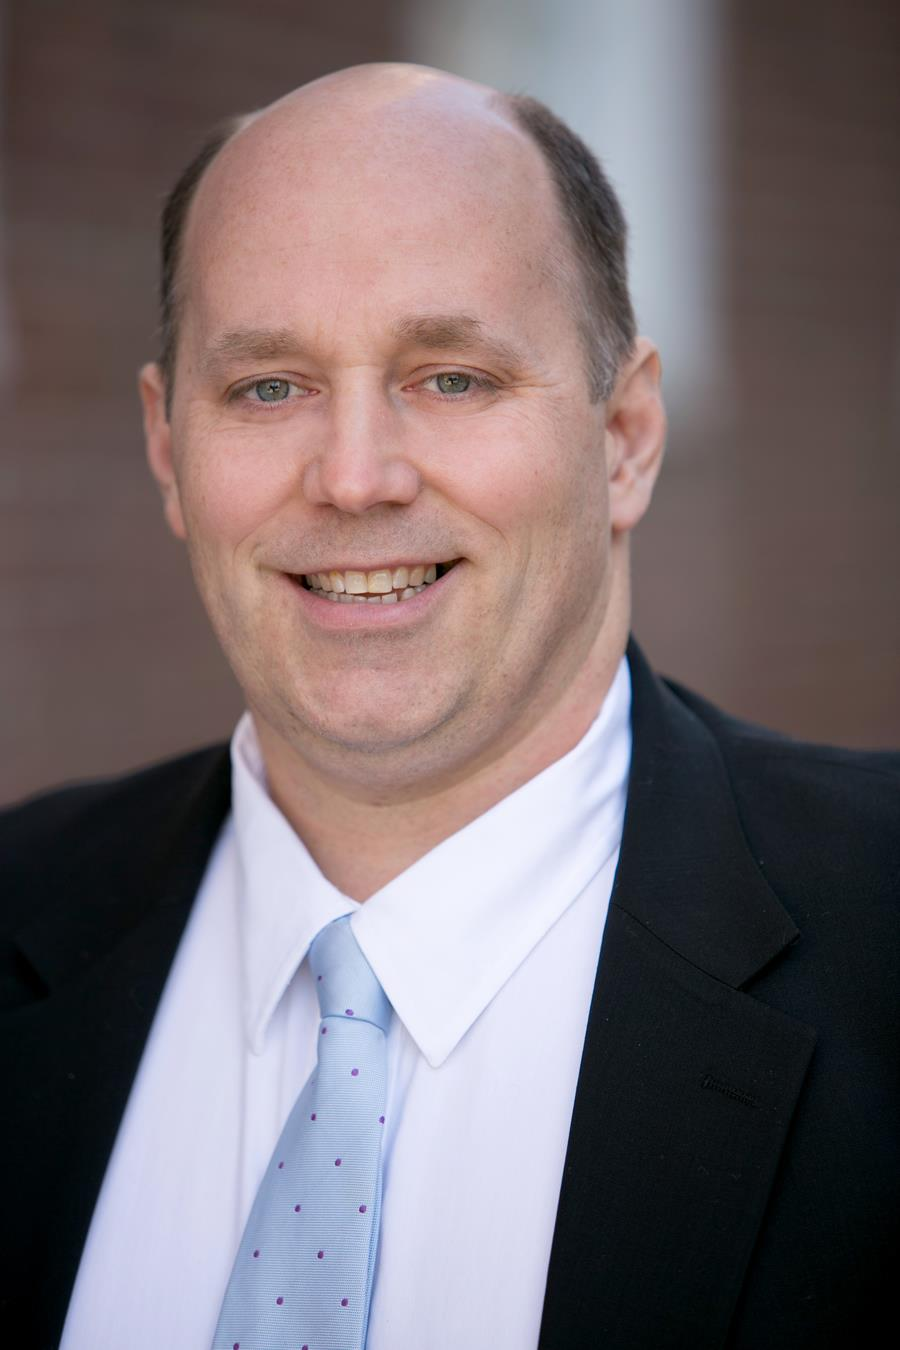 Ron Schuler